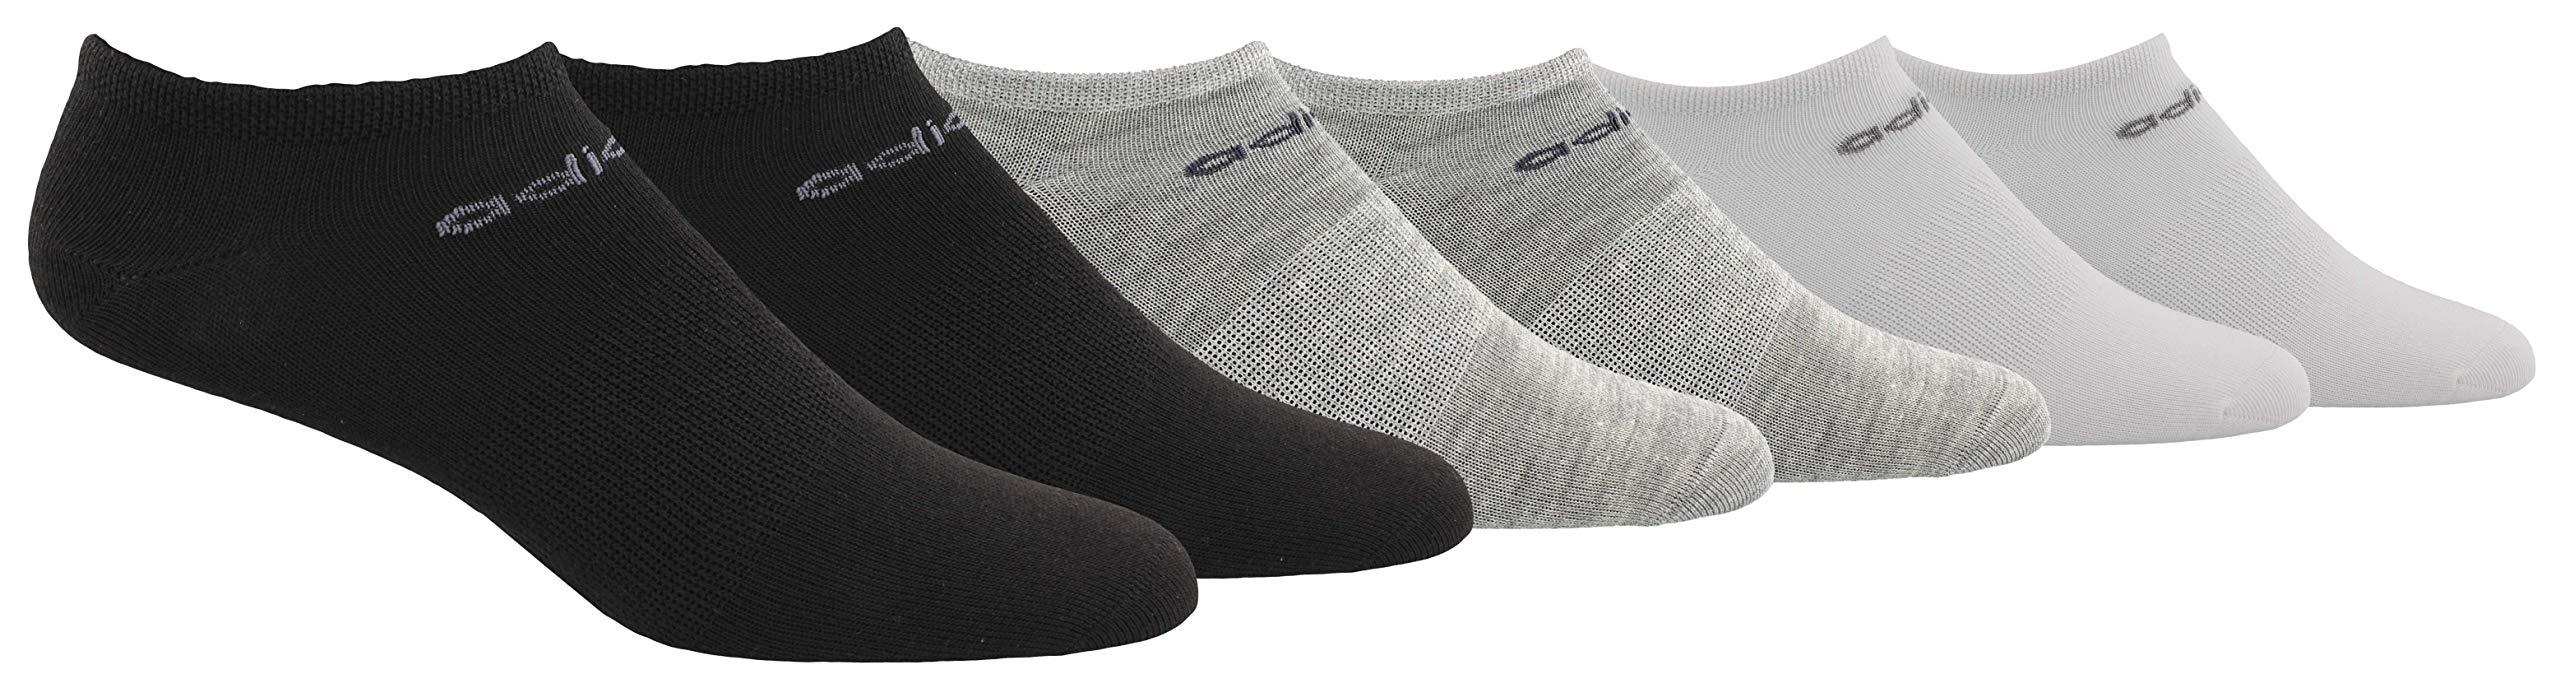 adidas Women's Superlite No Show Socks (6-Pair), Black/Light Heather Grey/White/Onix/Light Onix, Medium, (Shoe Size 5-10) by adidas